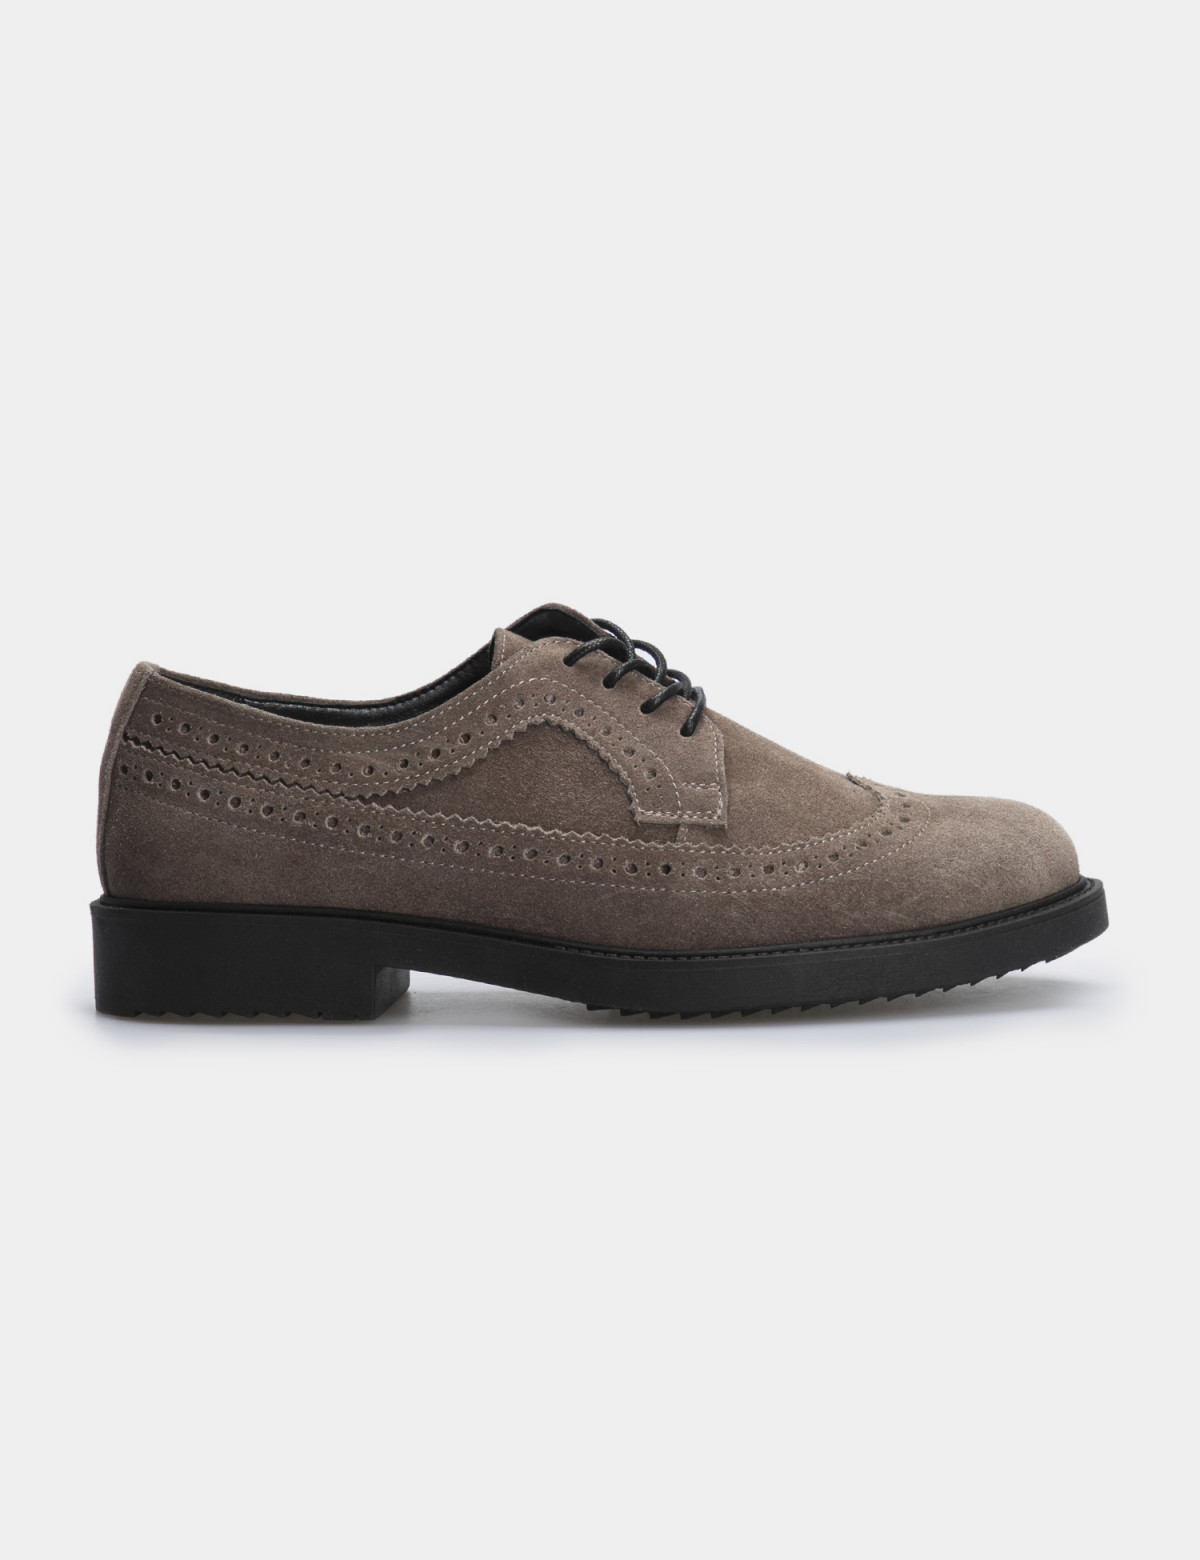 Туфлі темно-бежеві, натуральна замша